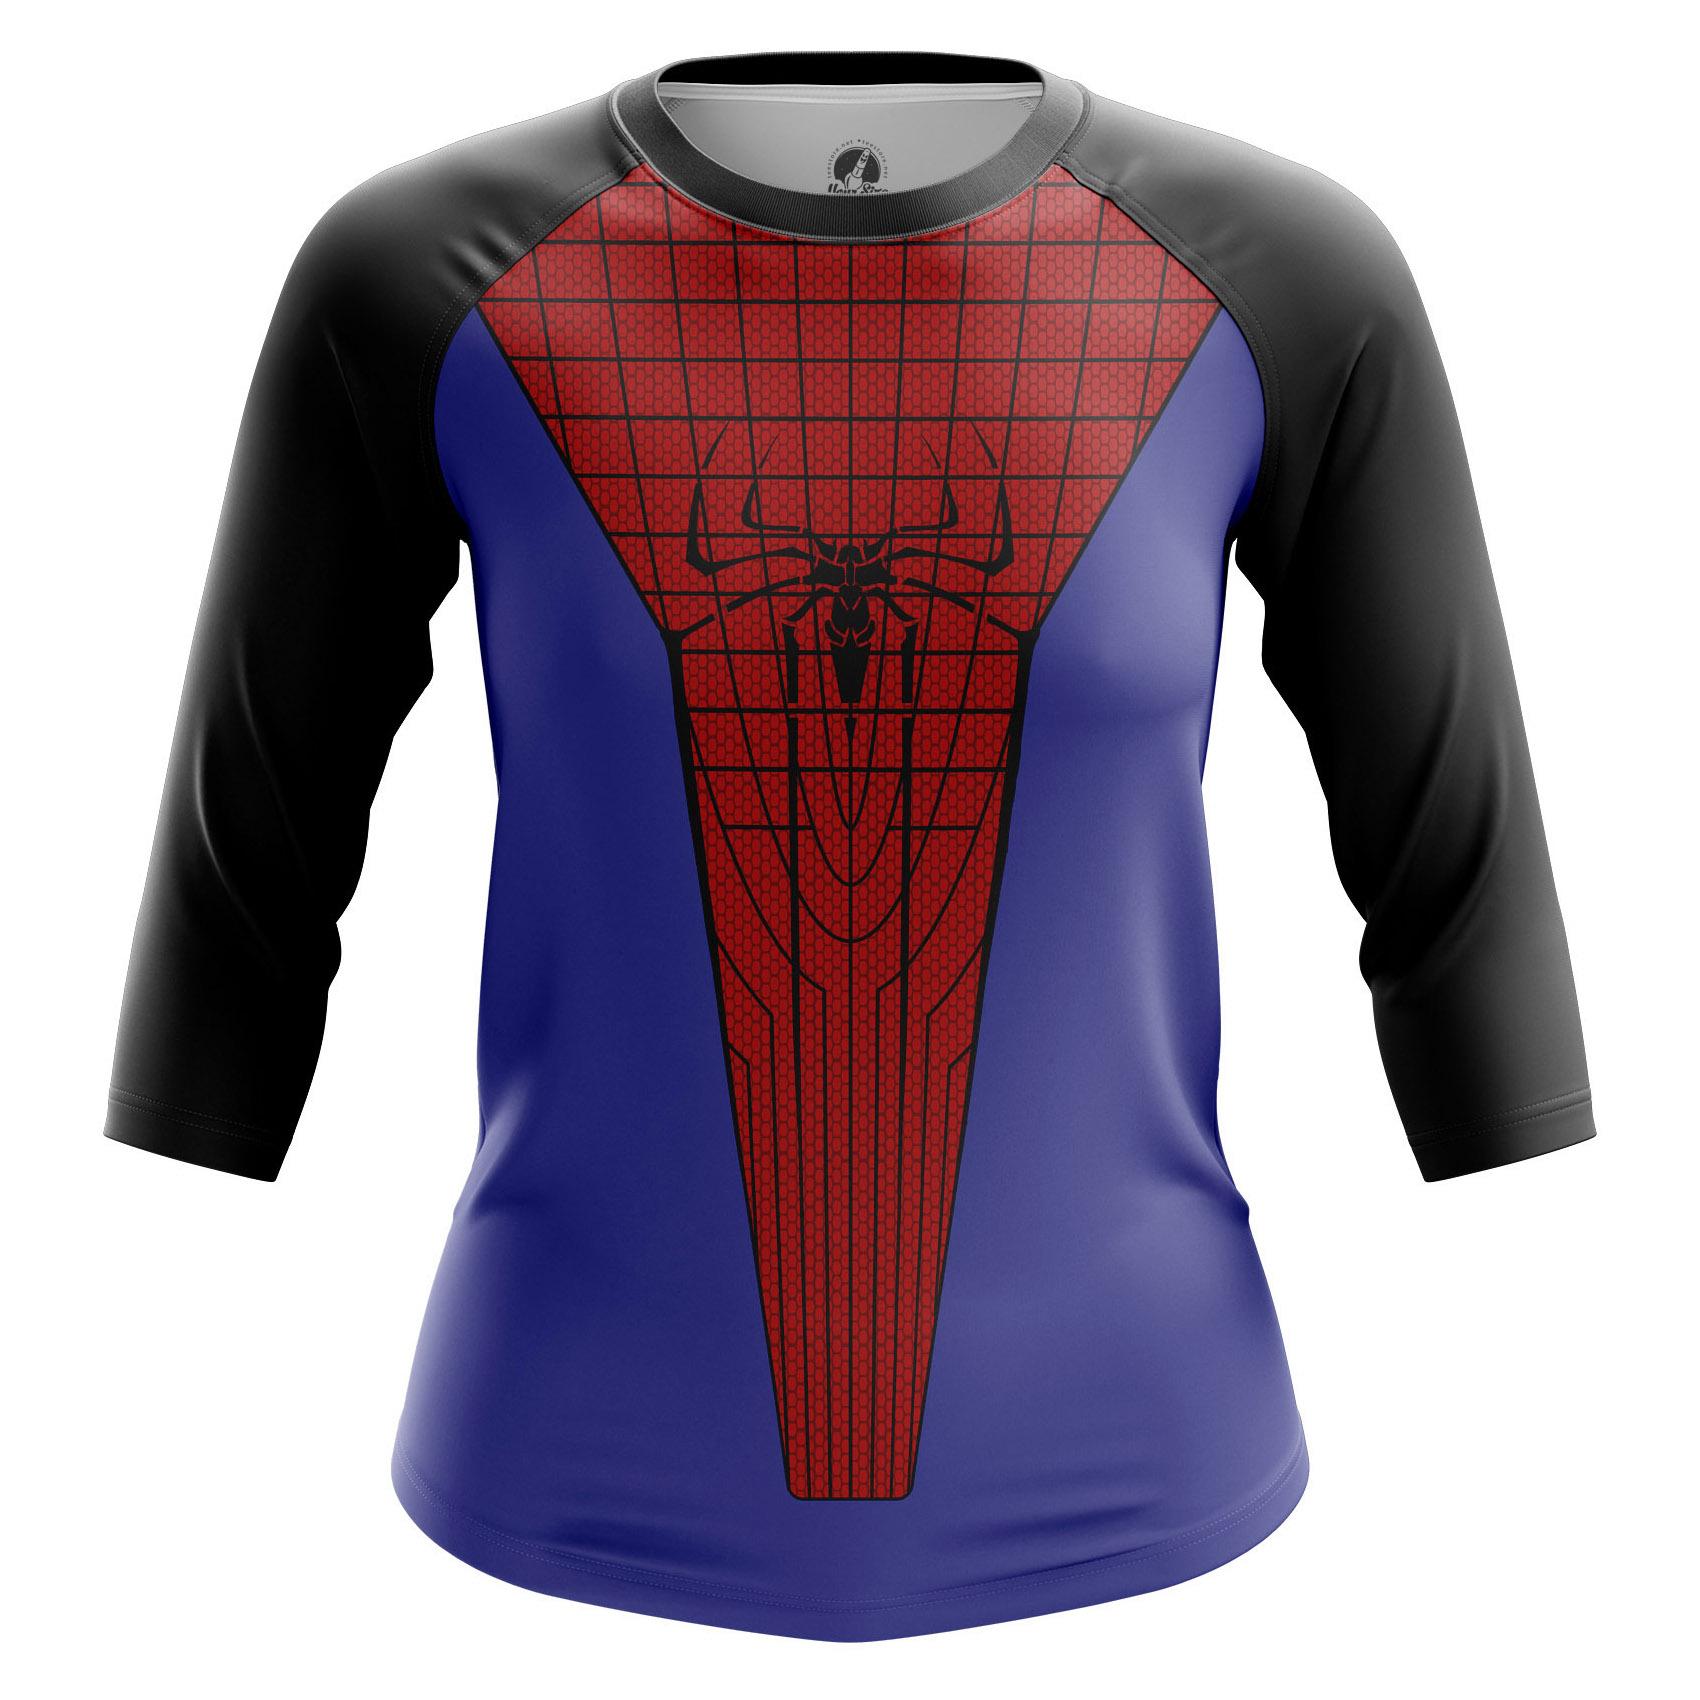 Collectibles Women'S Raglan Spiderman Suit Spider-Man Costume